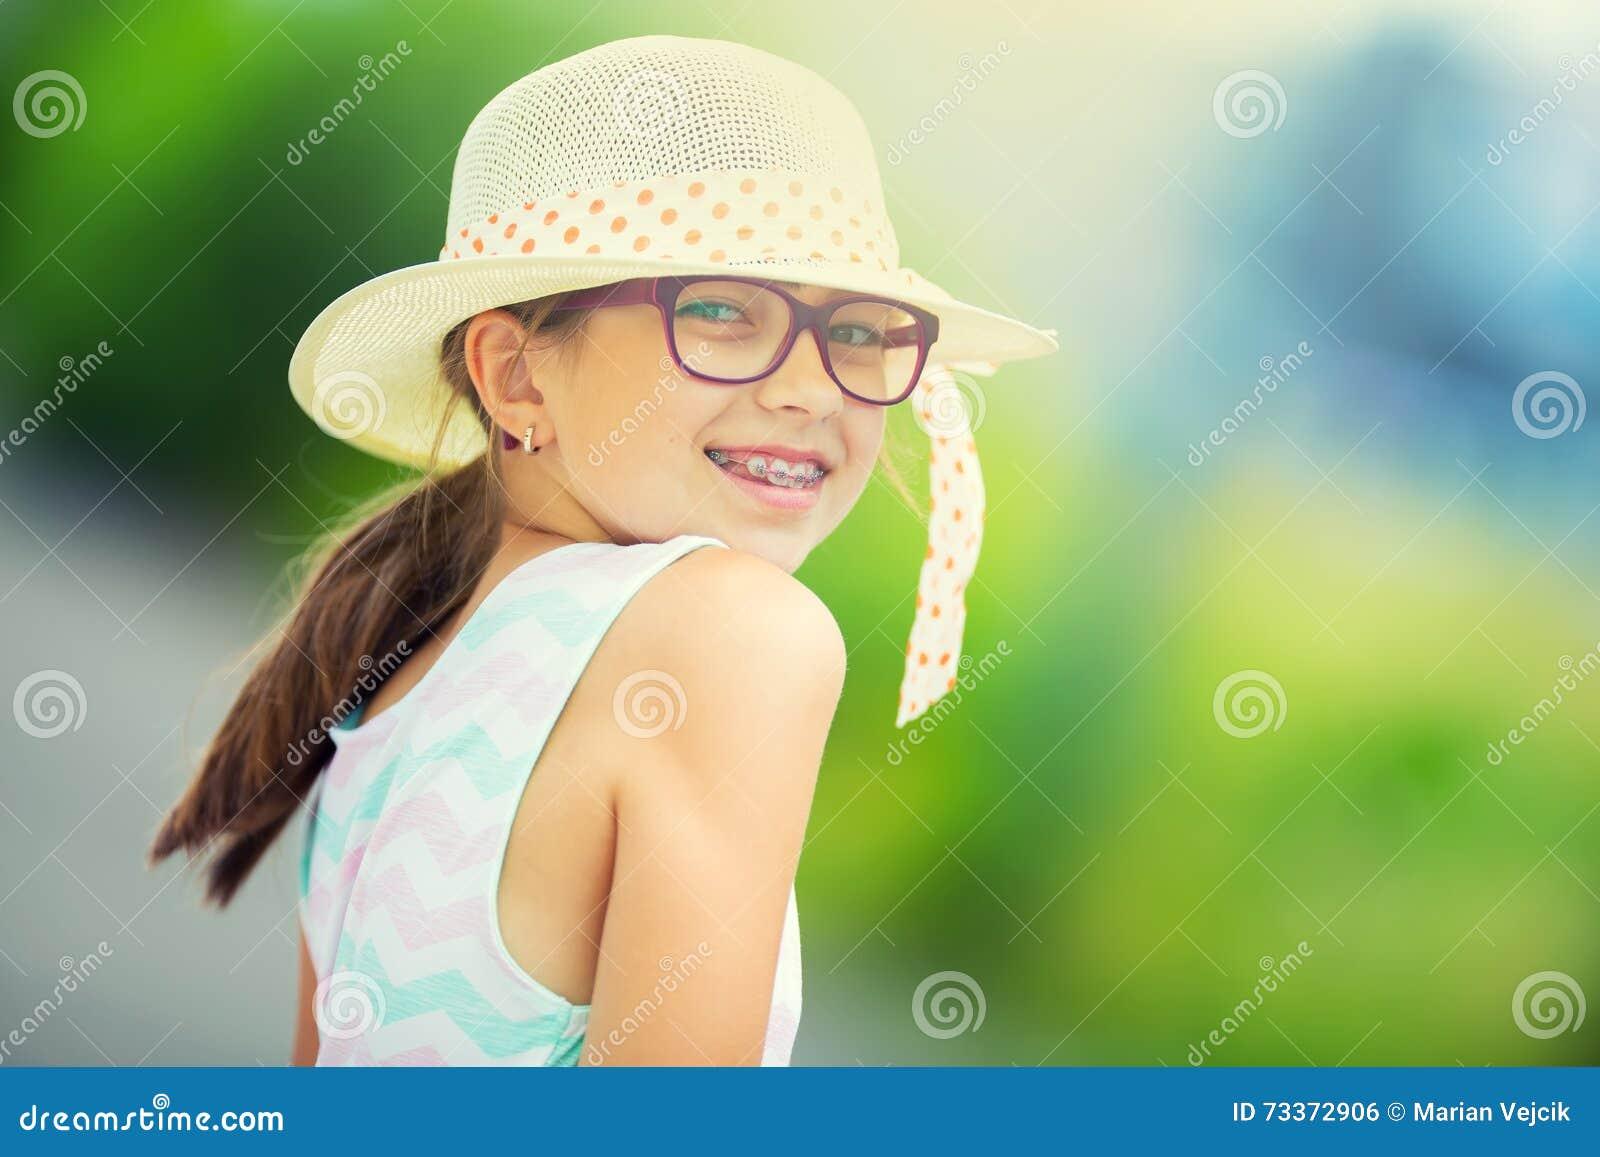 Opinion Young teen girls braces facial amusing information